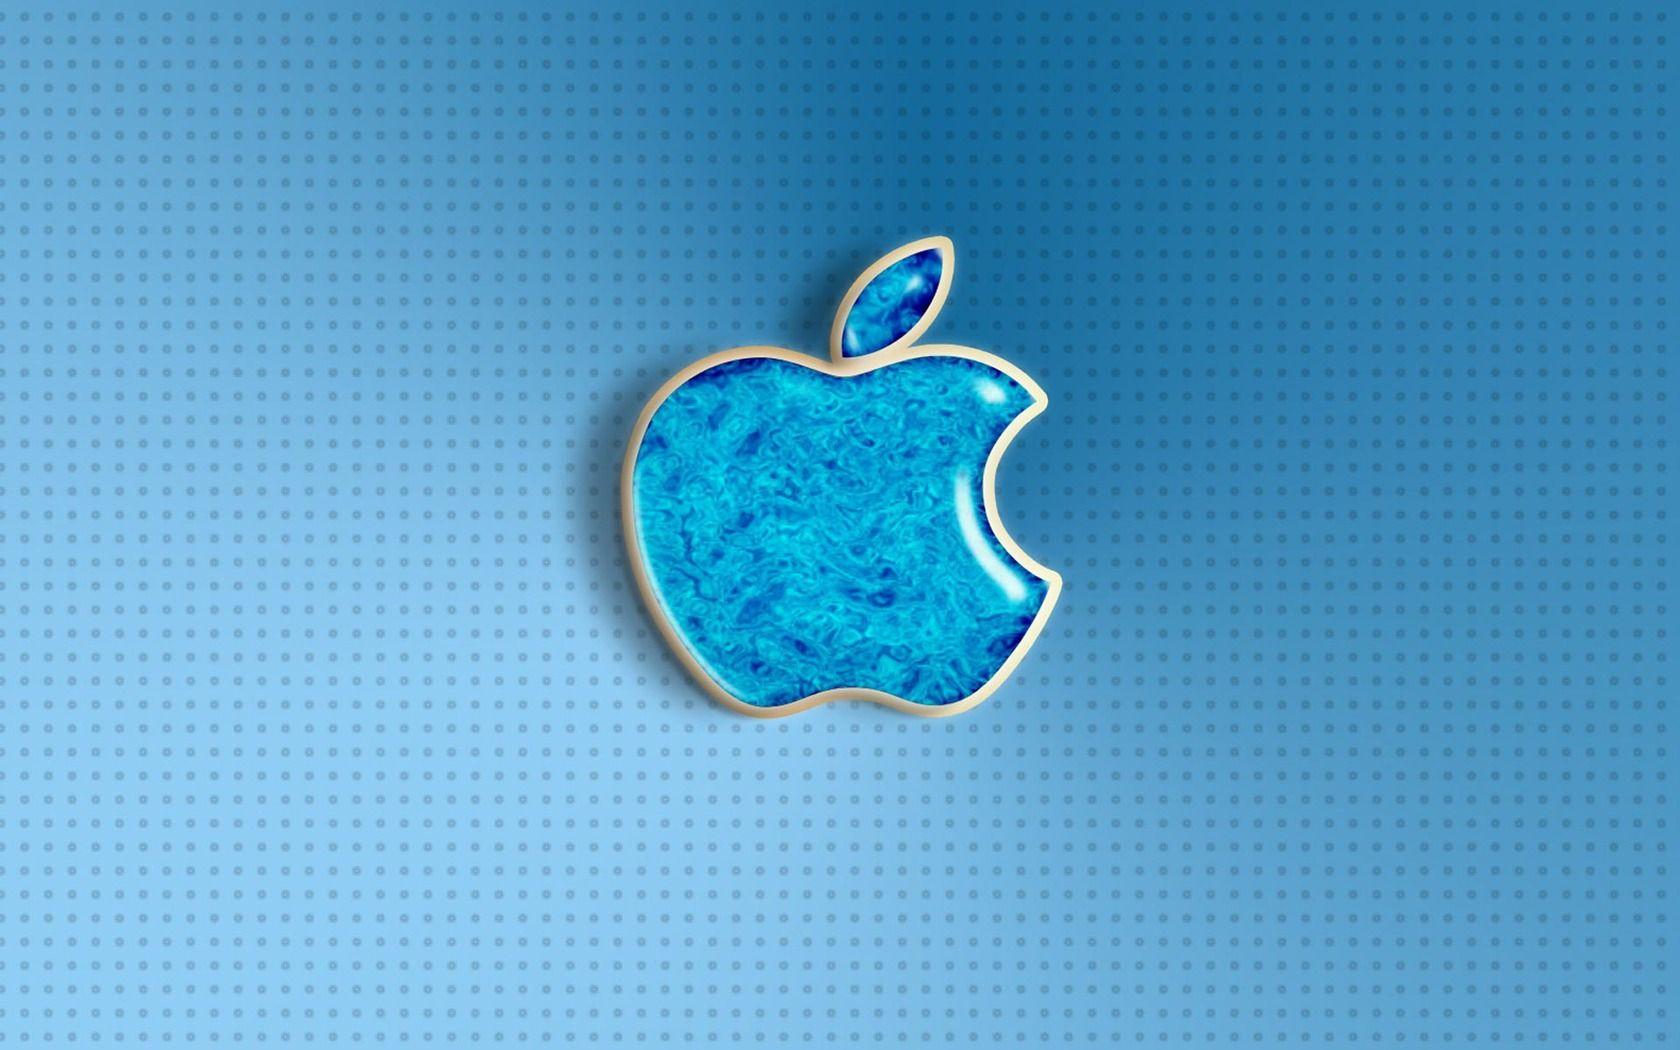 cool apple logo wallpaper for ipad. apple pink logo blue - bing images cool wallpaper for ipad